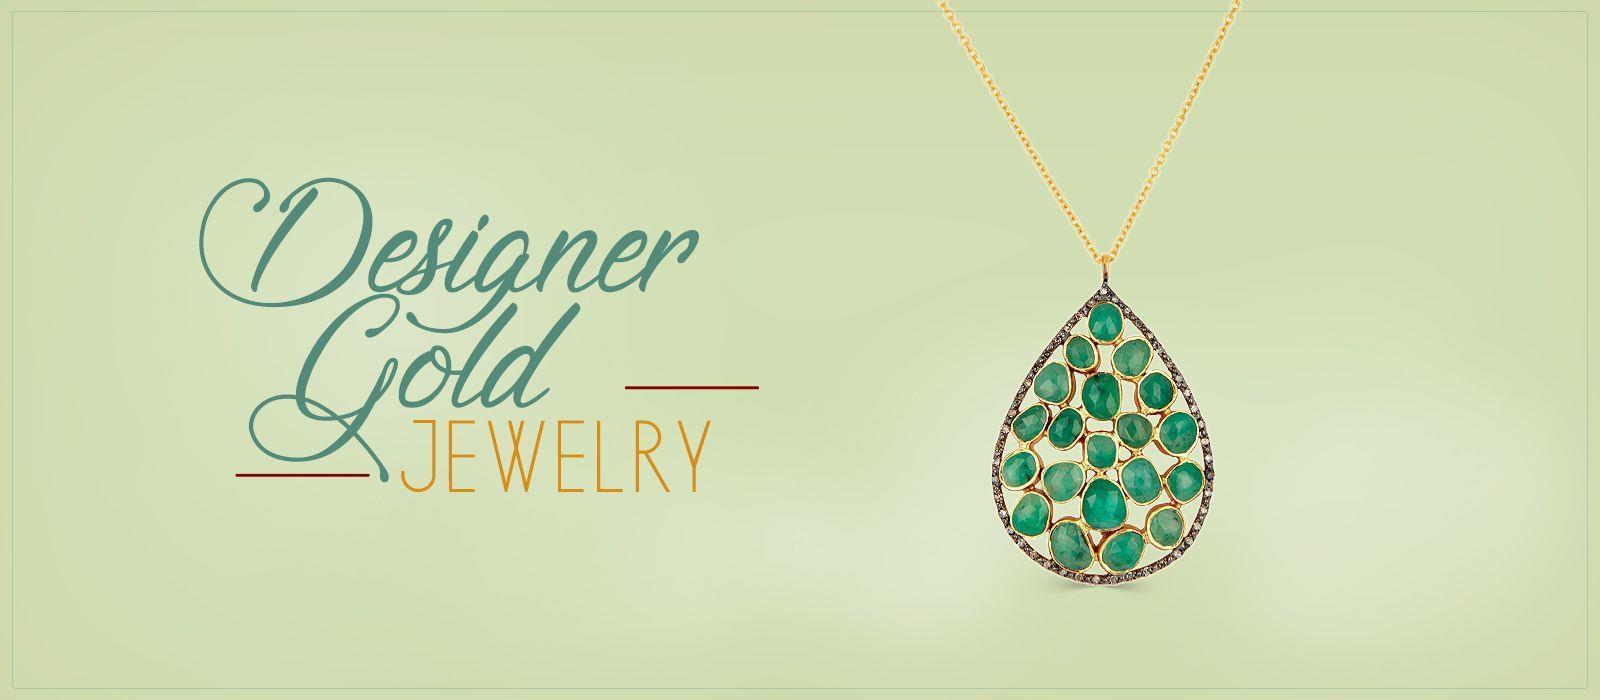 Designer Gold Jewelry